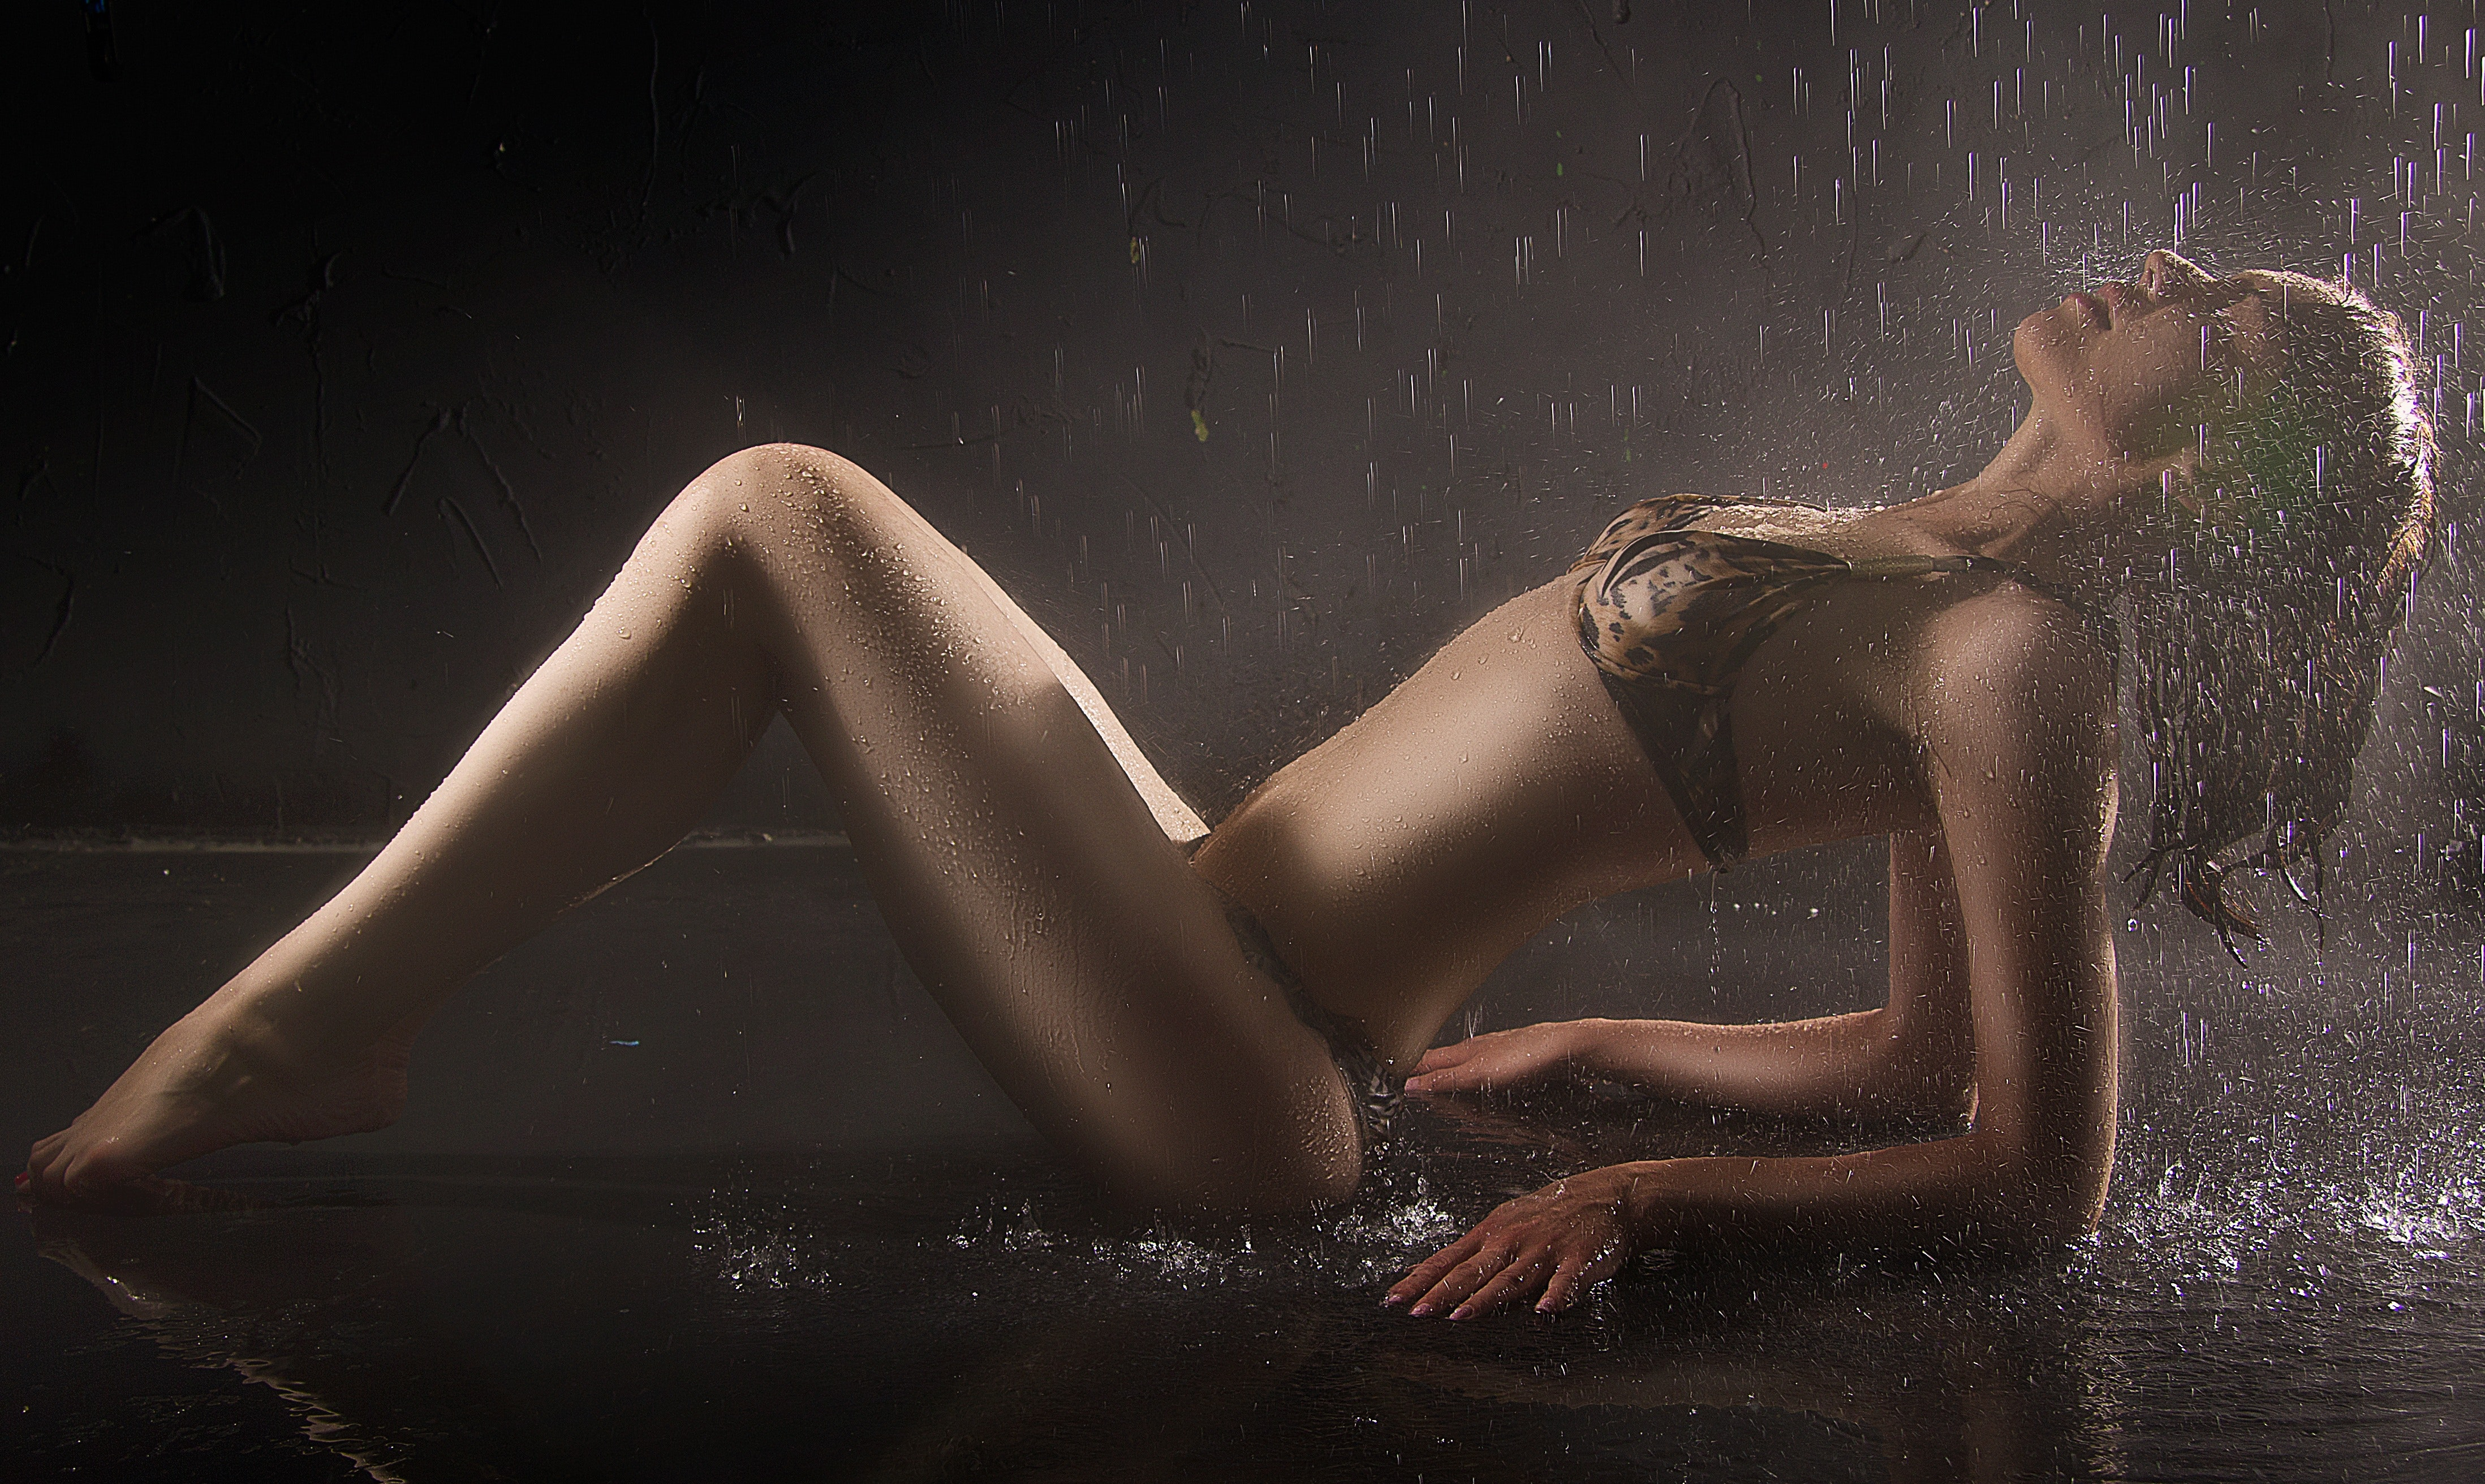 badeanzug-bikini-erotisch-206369